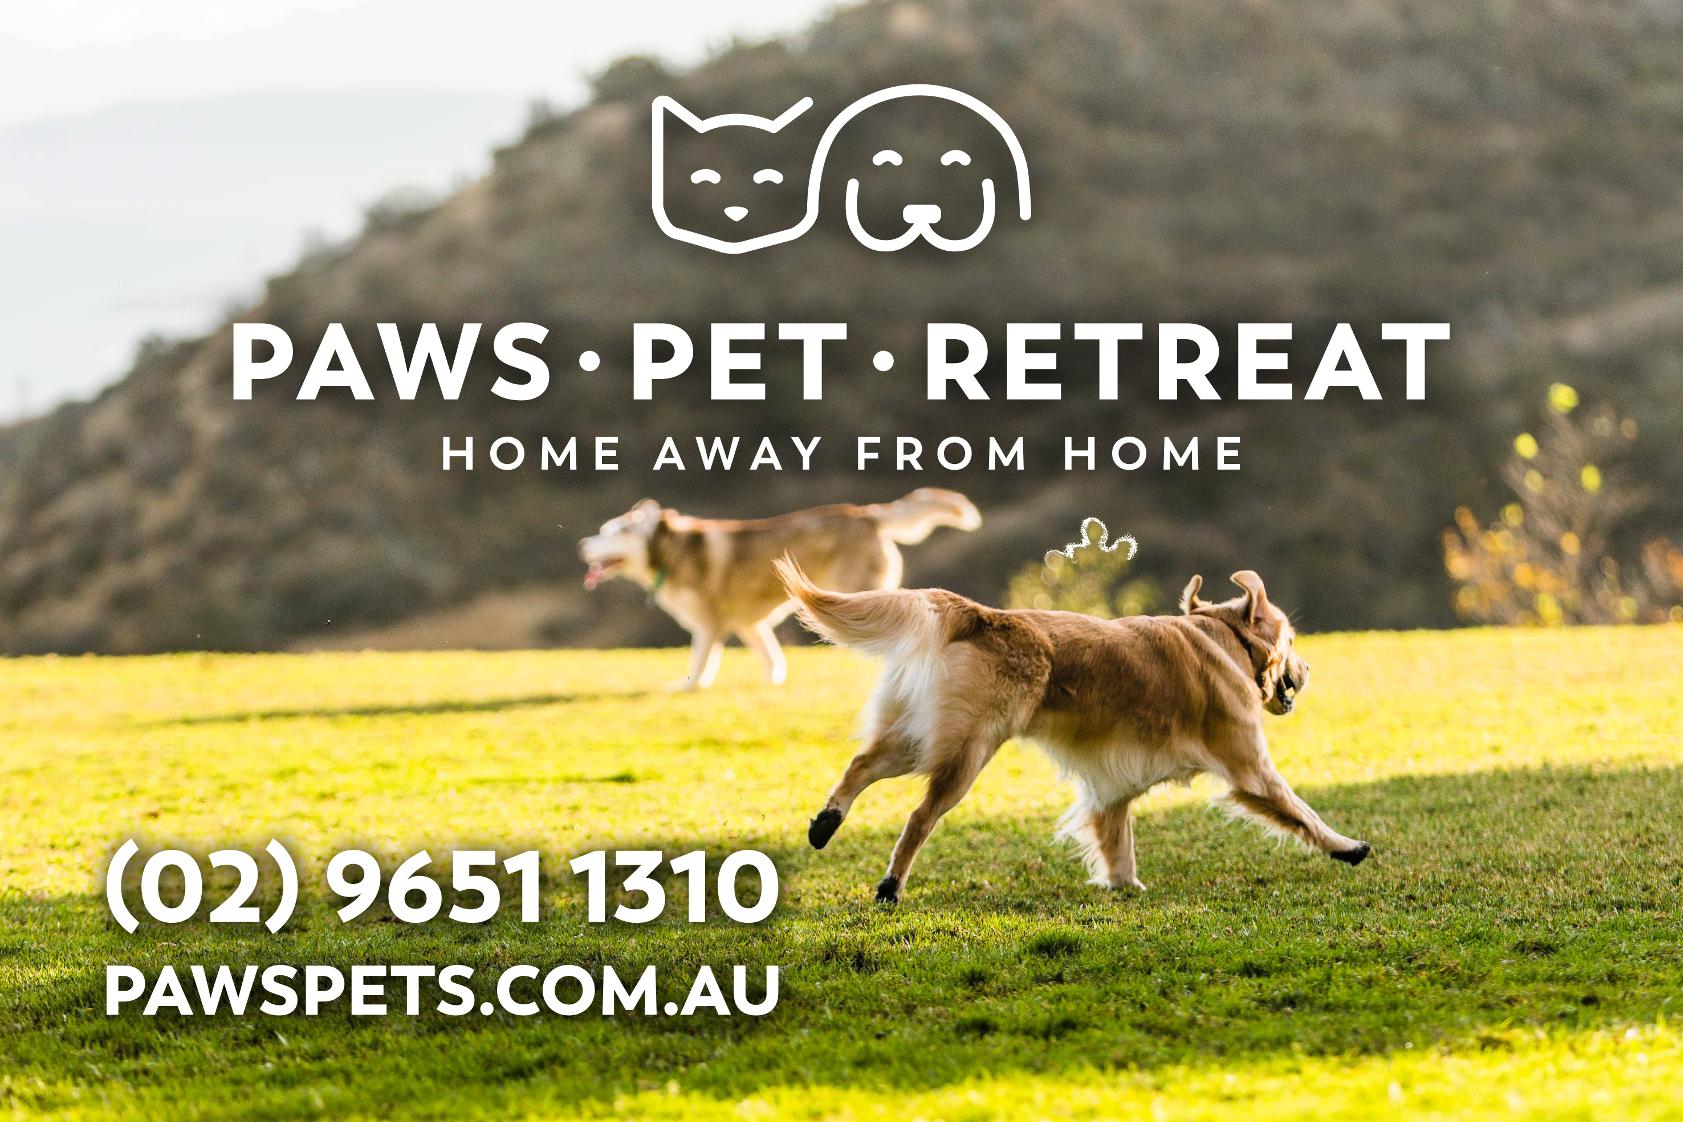 Paws Pet Retreat